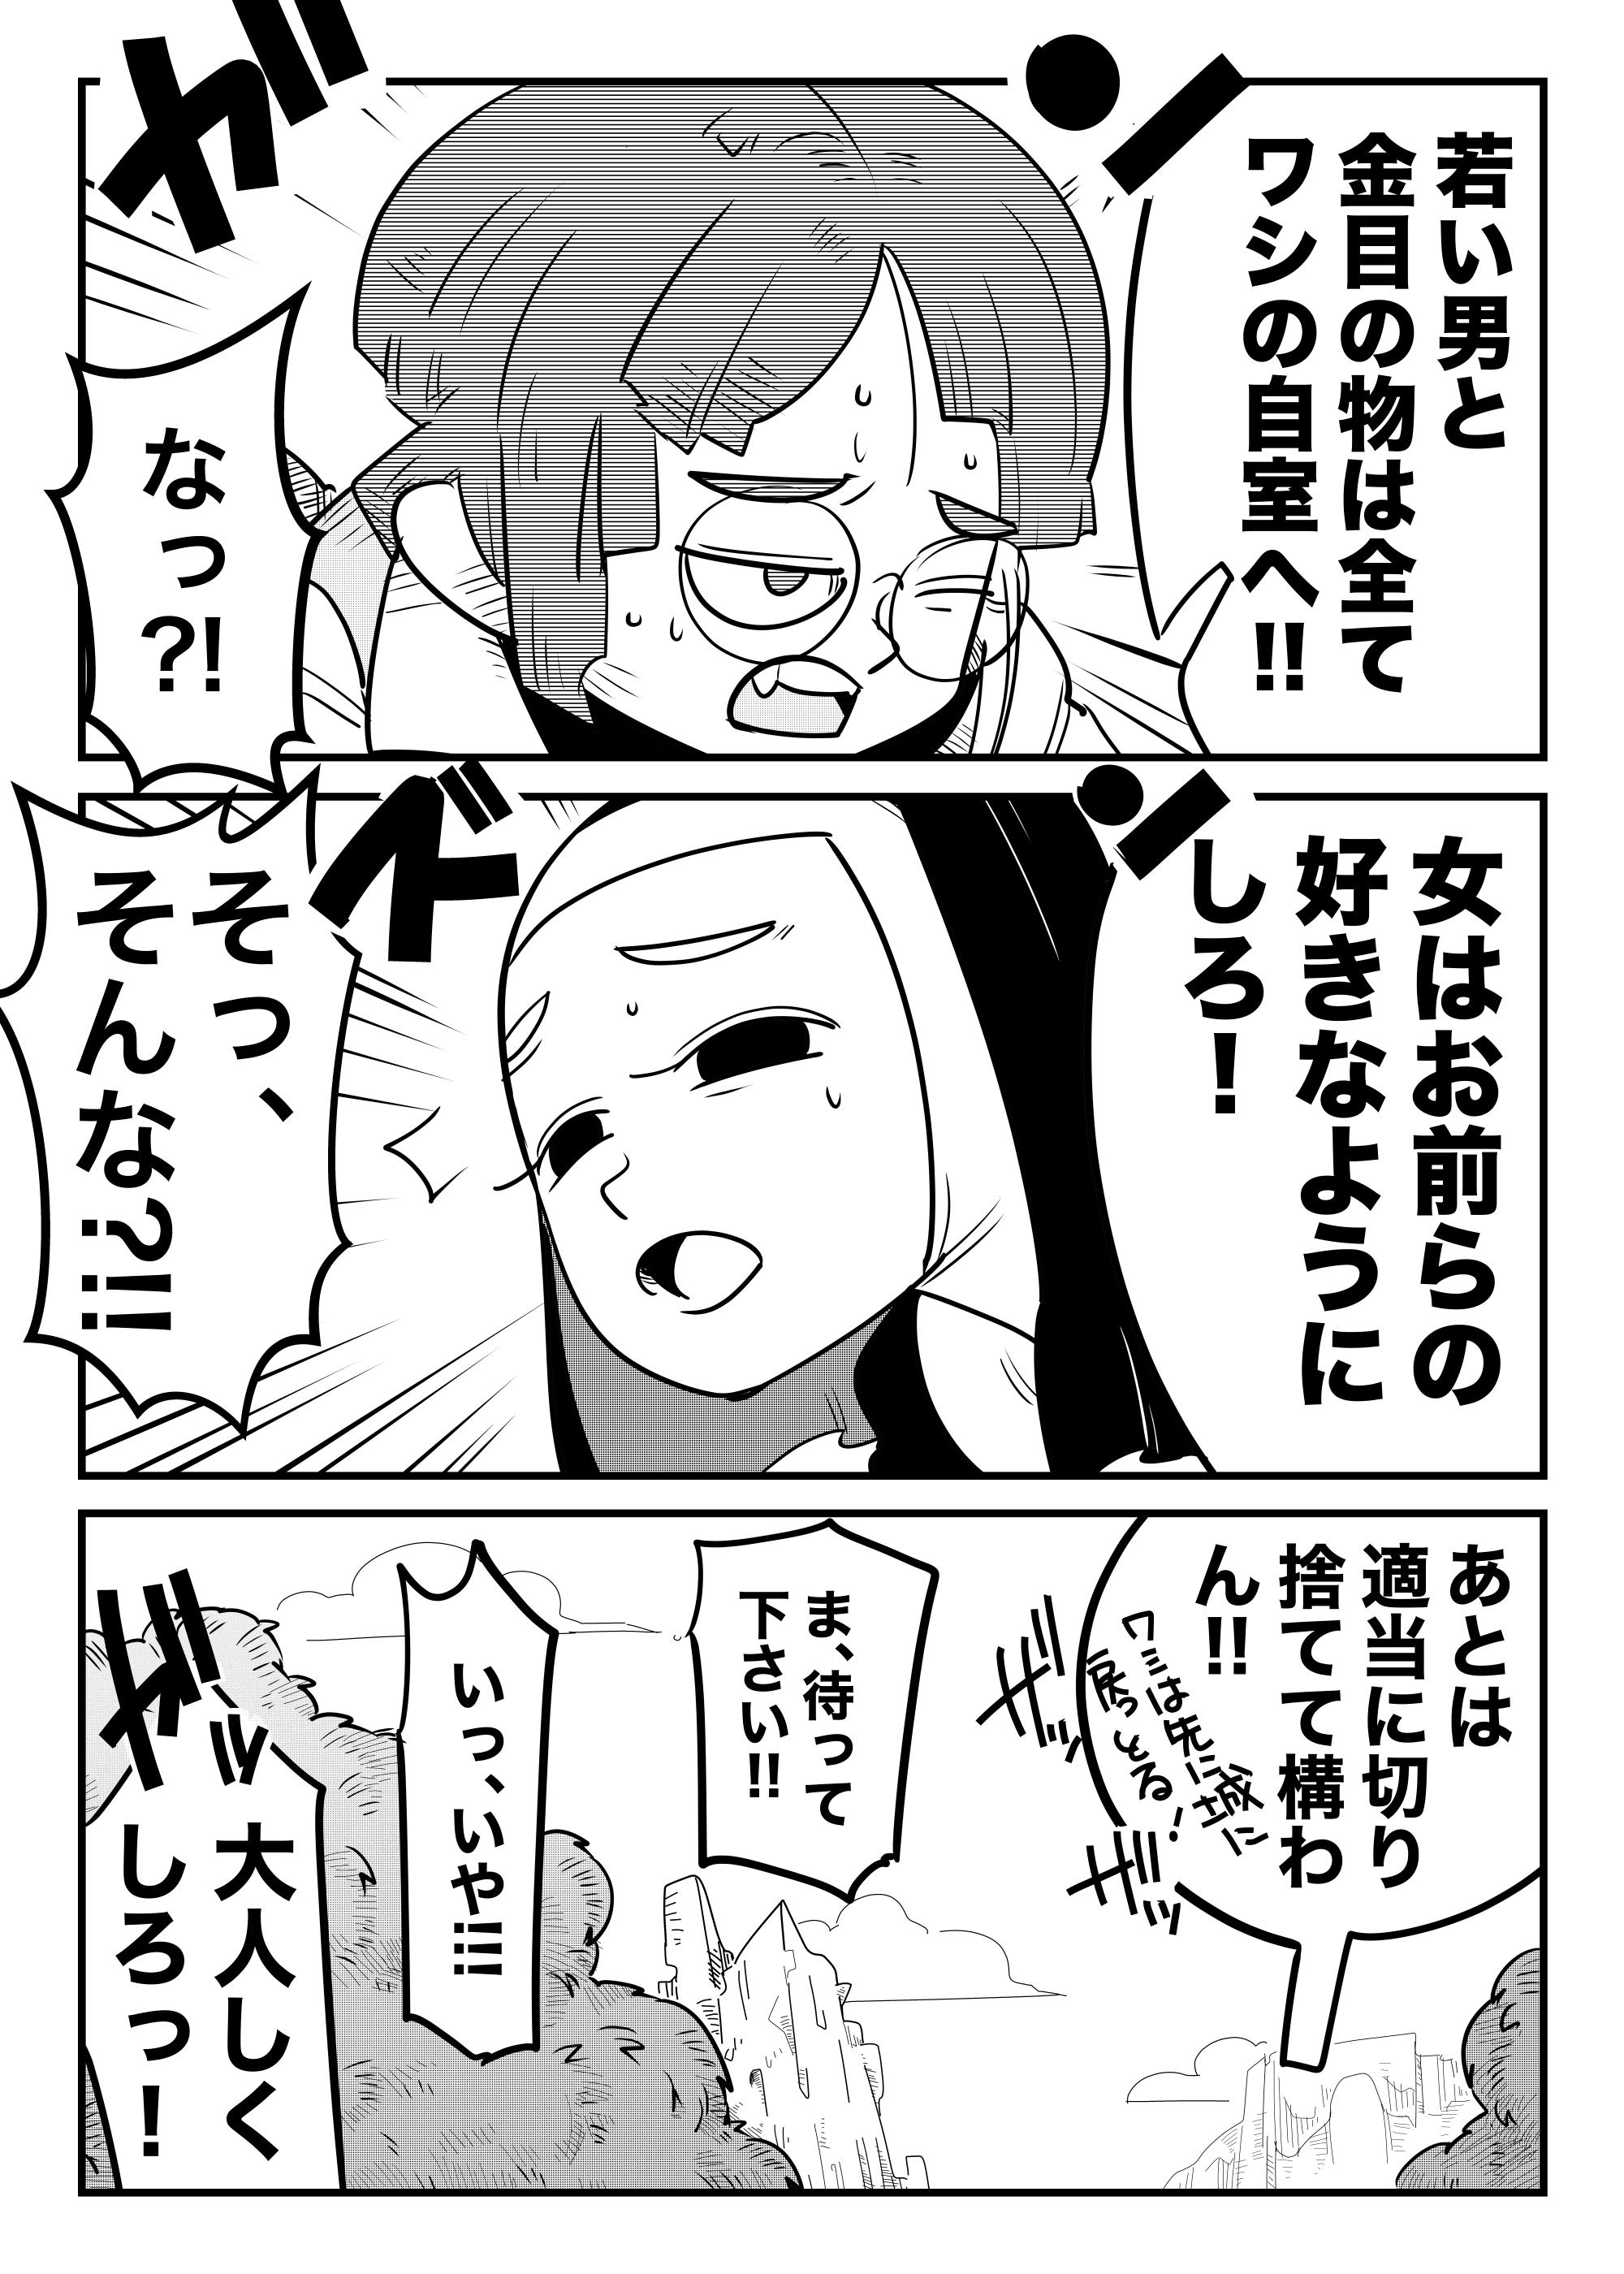 f:id:terashimaru117:20210914183110p:plain